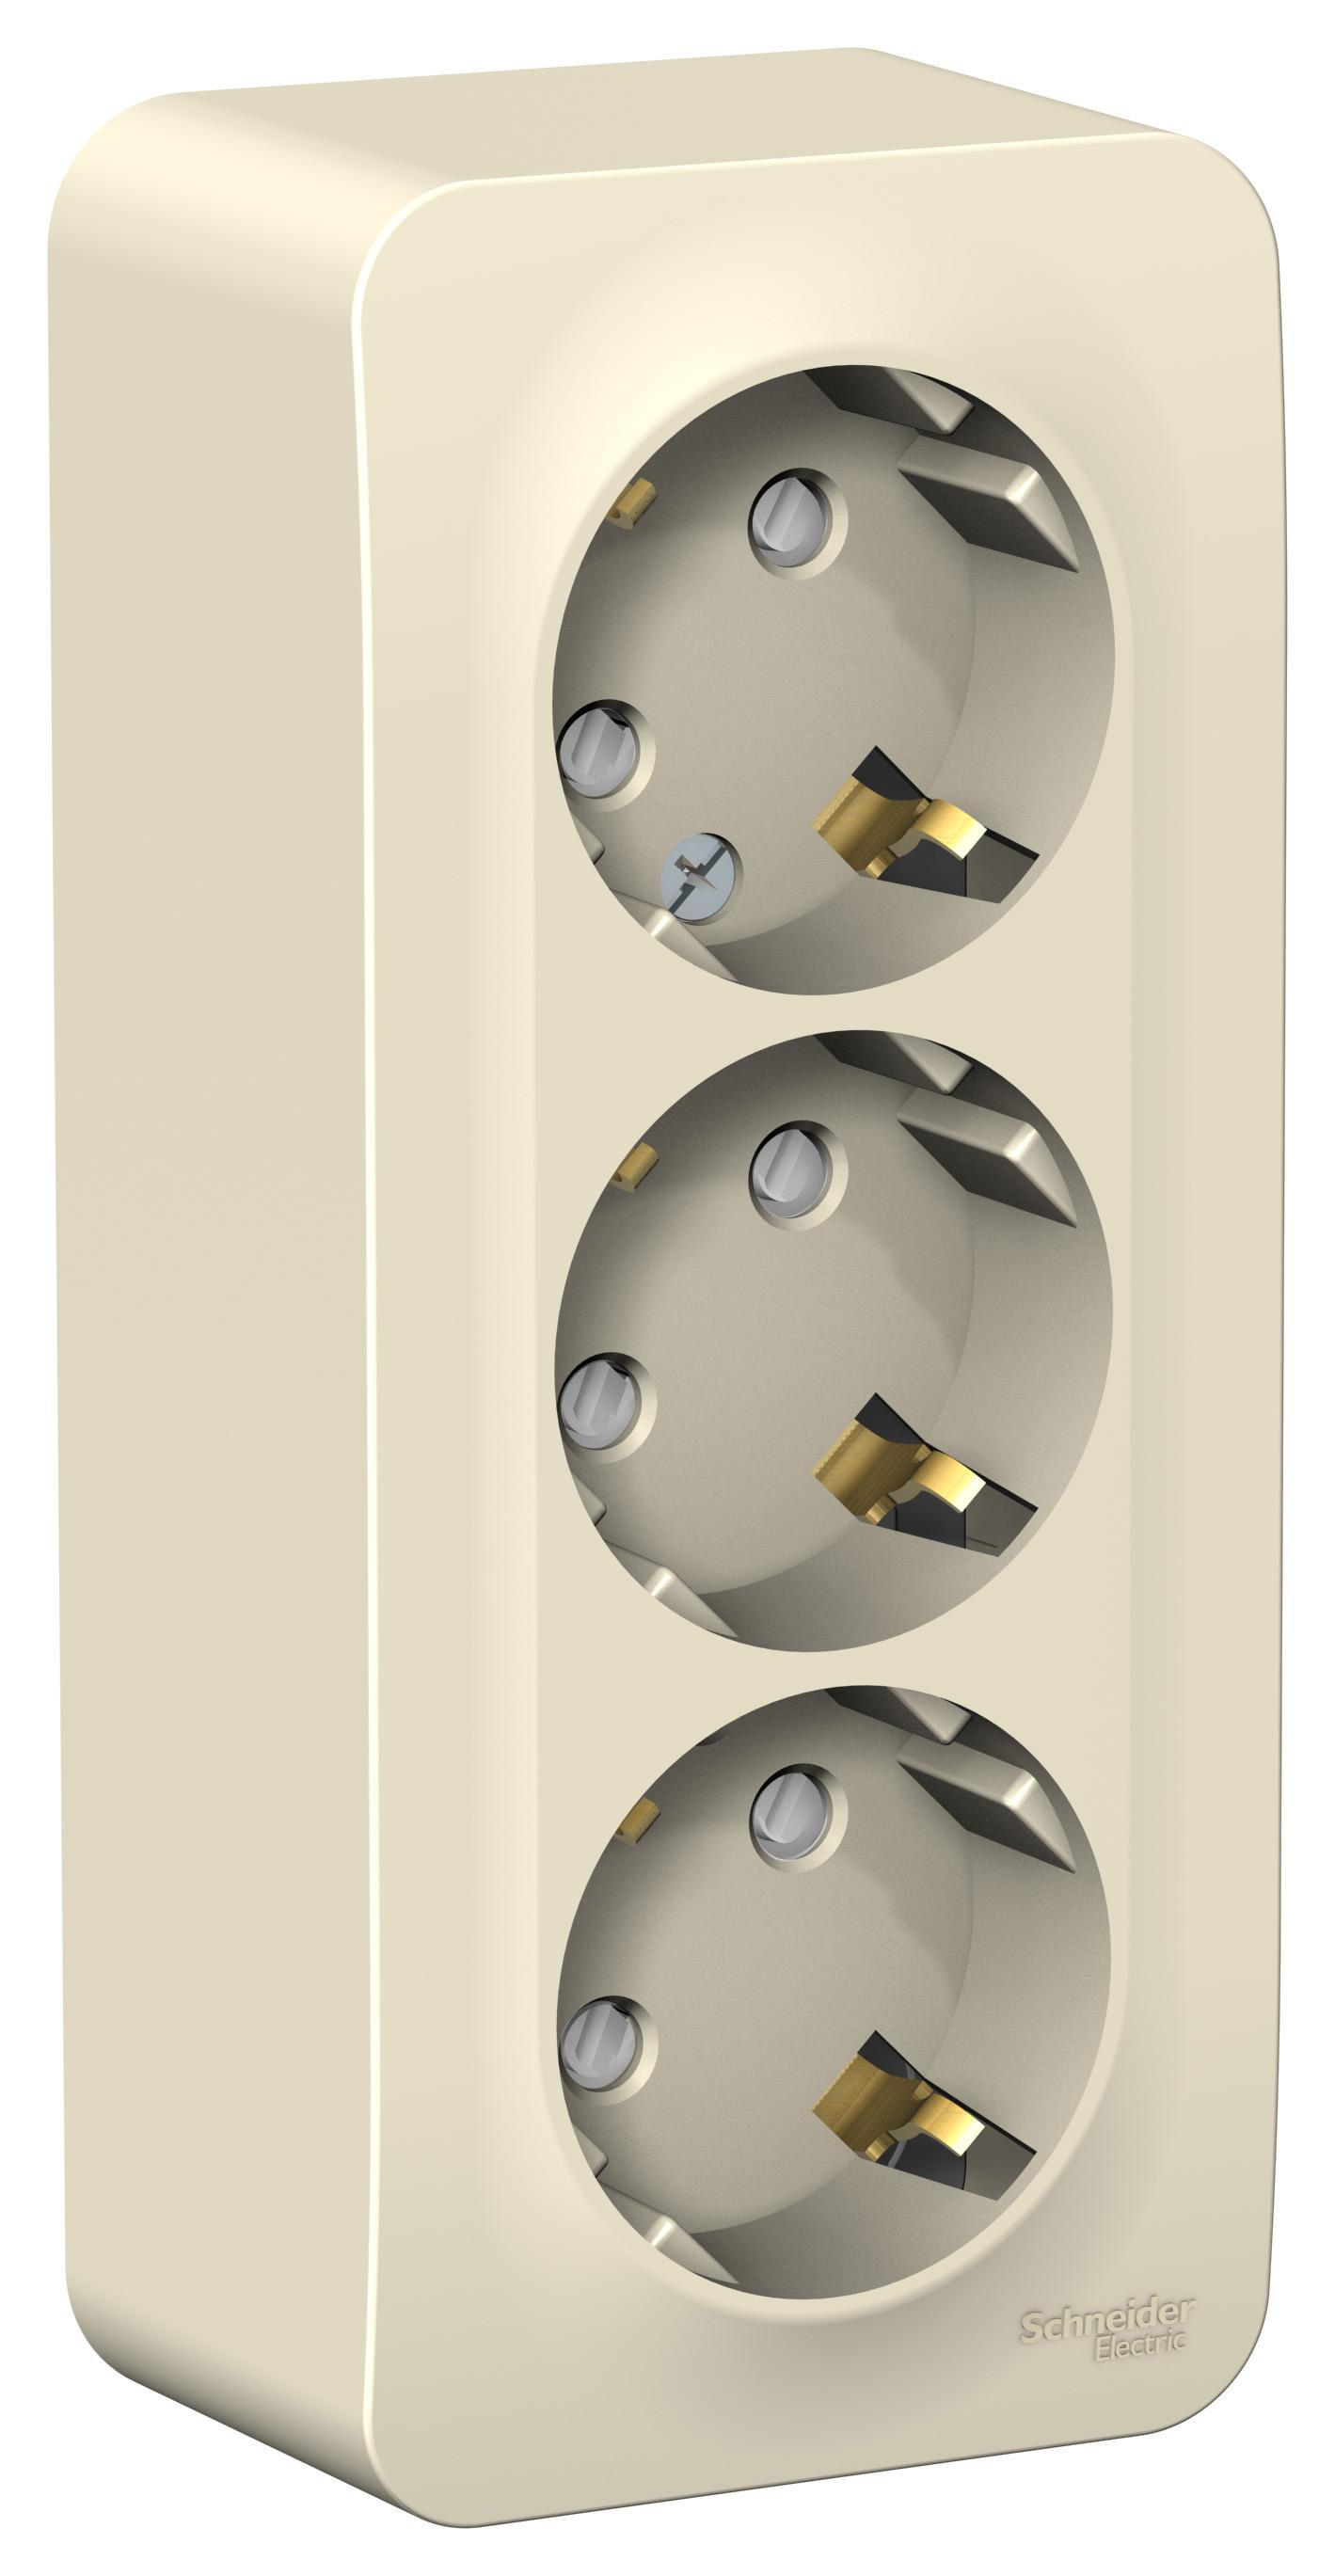 Розетка Schneider electric Blnra011312 blanca